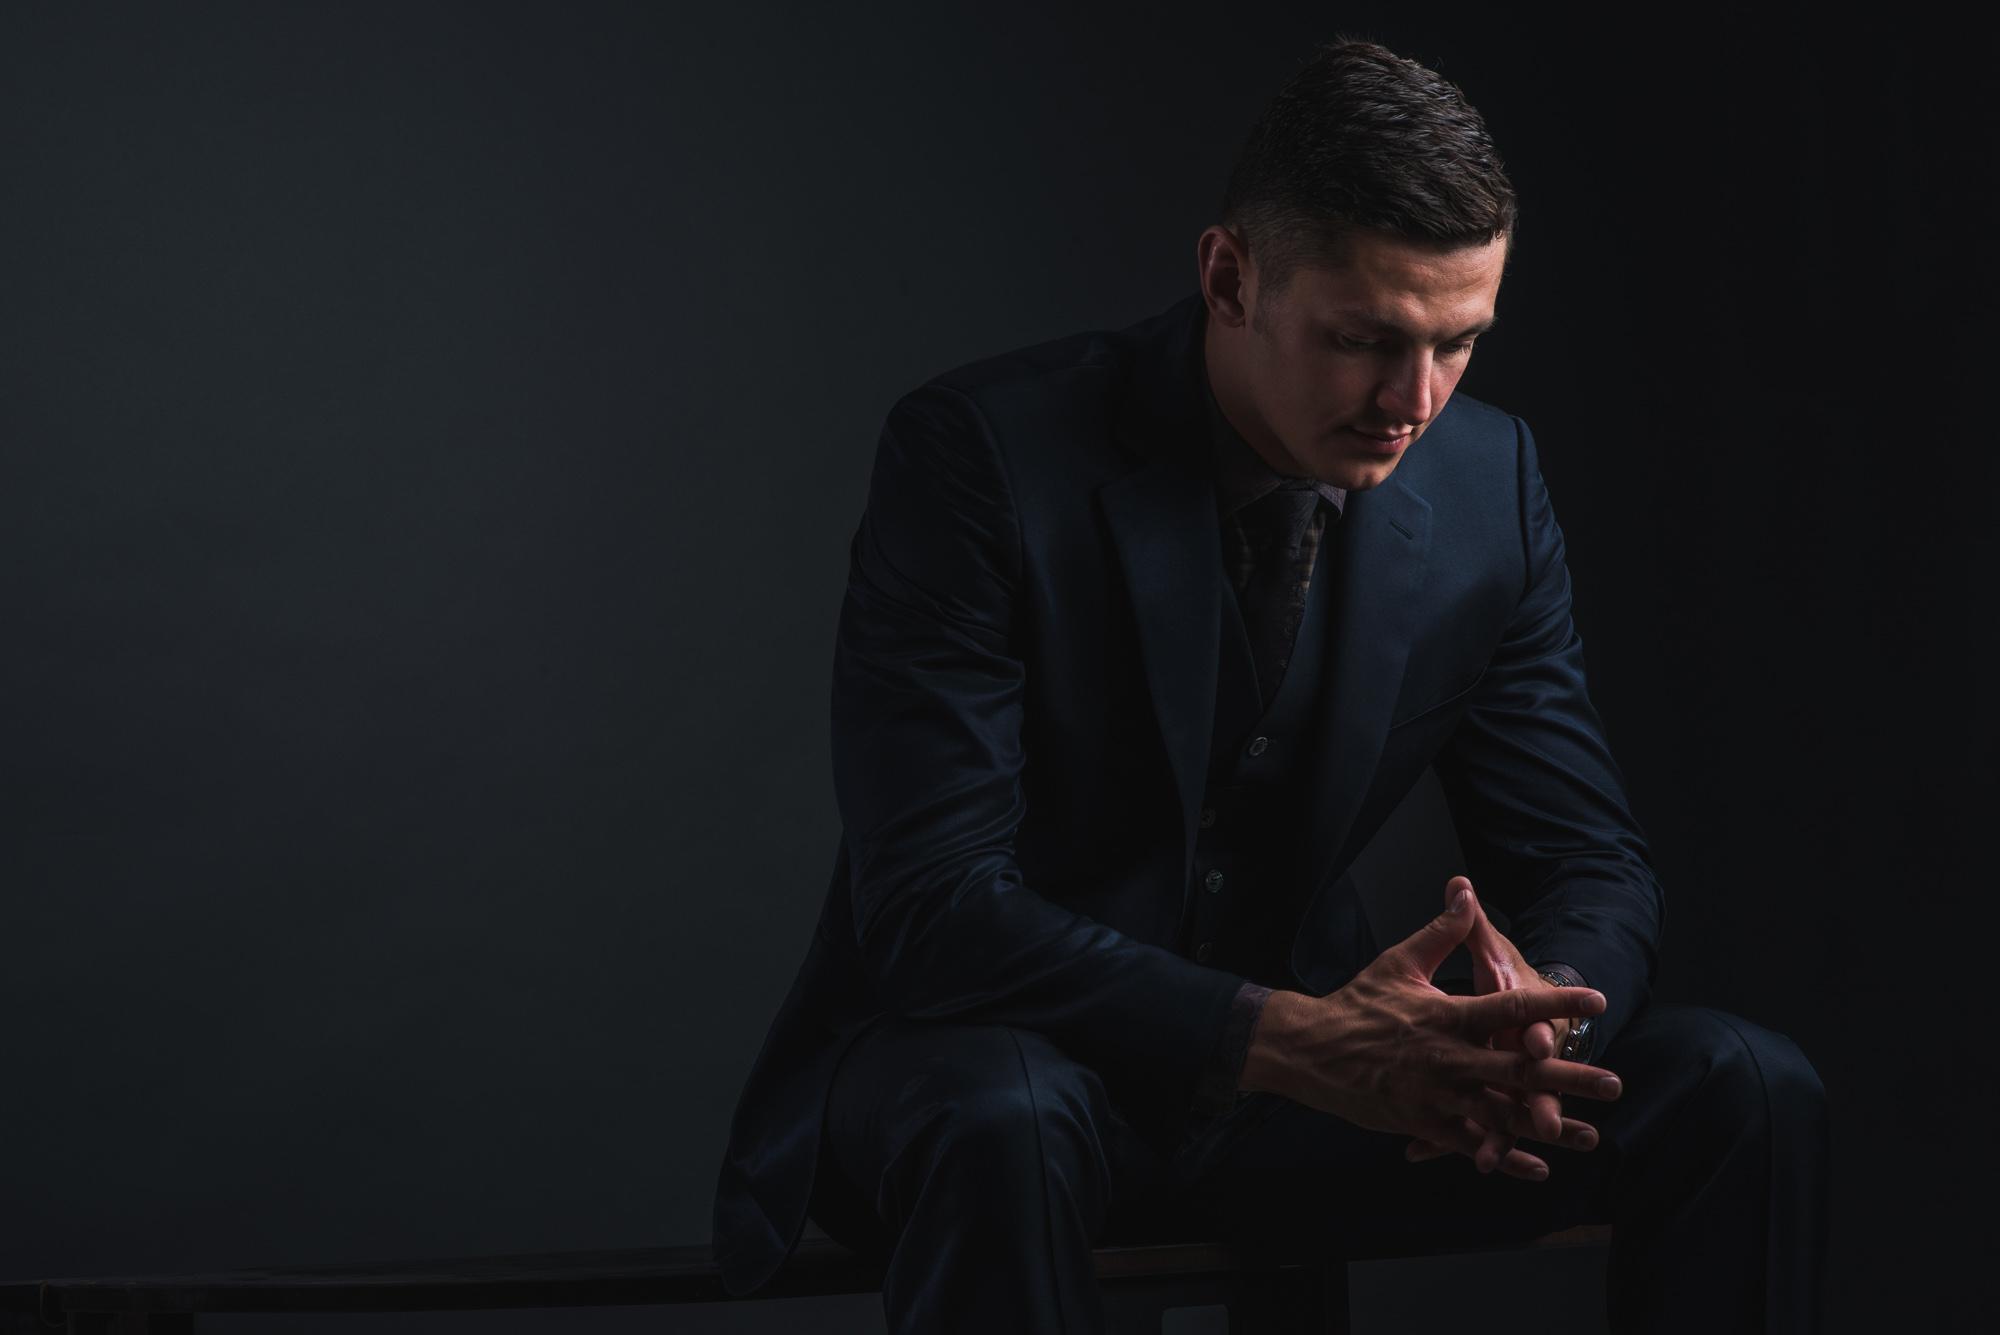 Maxim-Business-Portrait-036.jpg